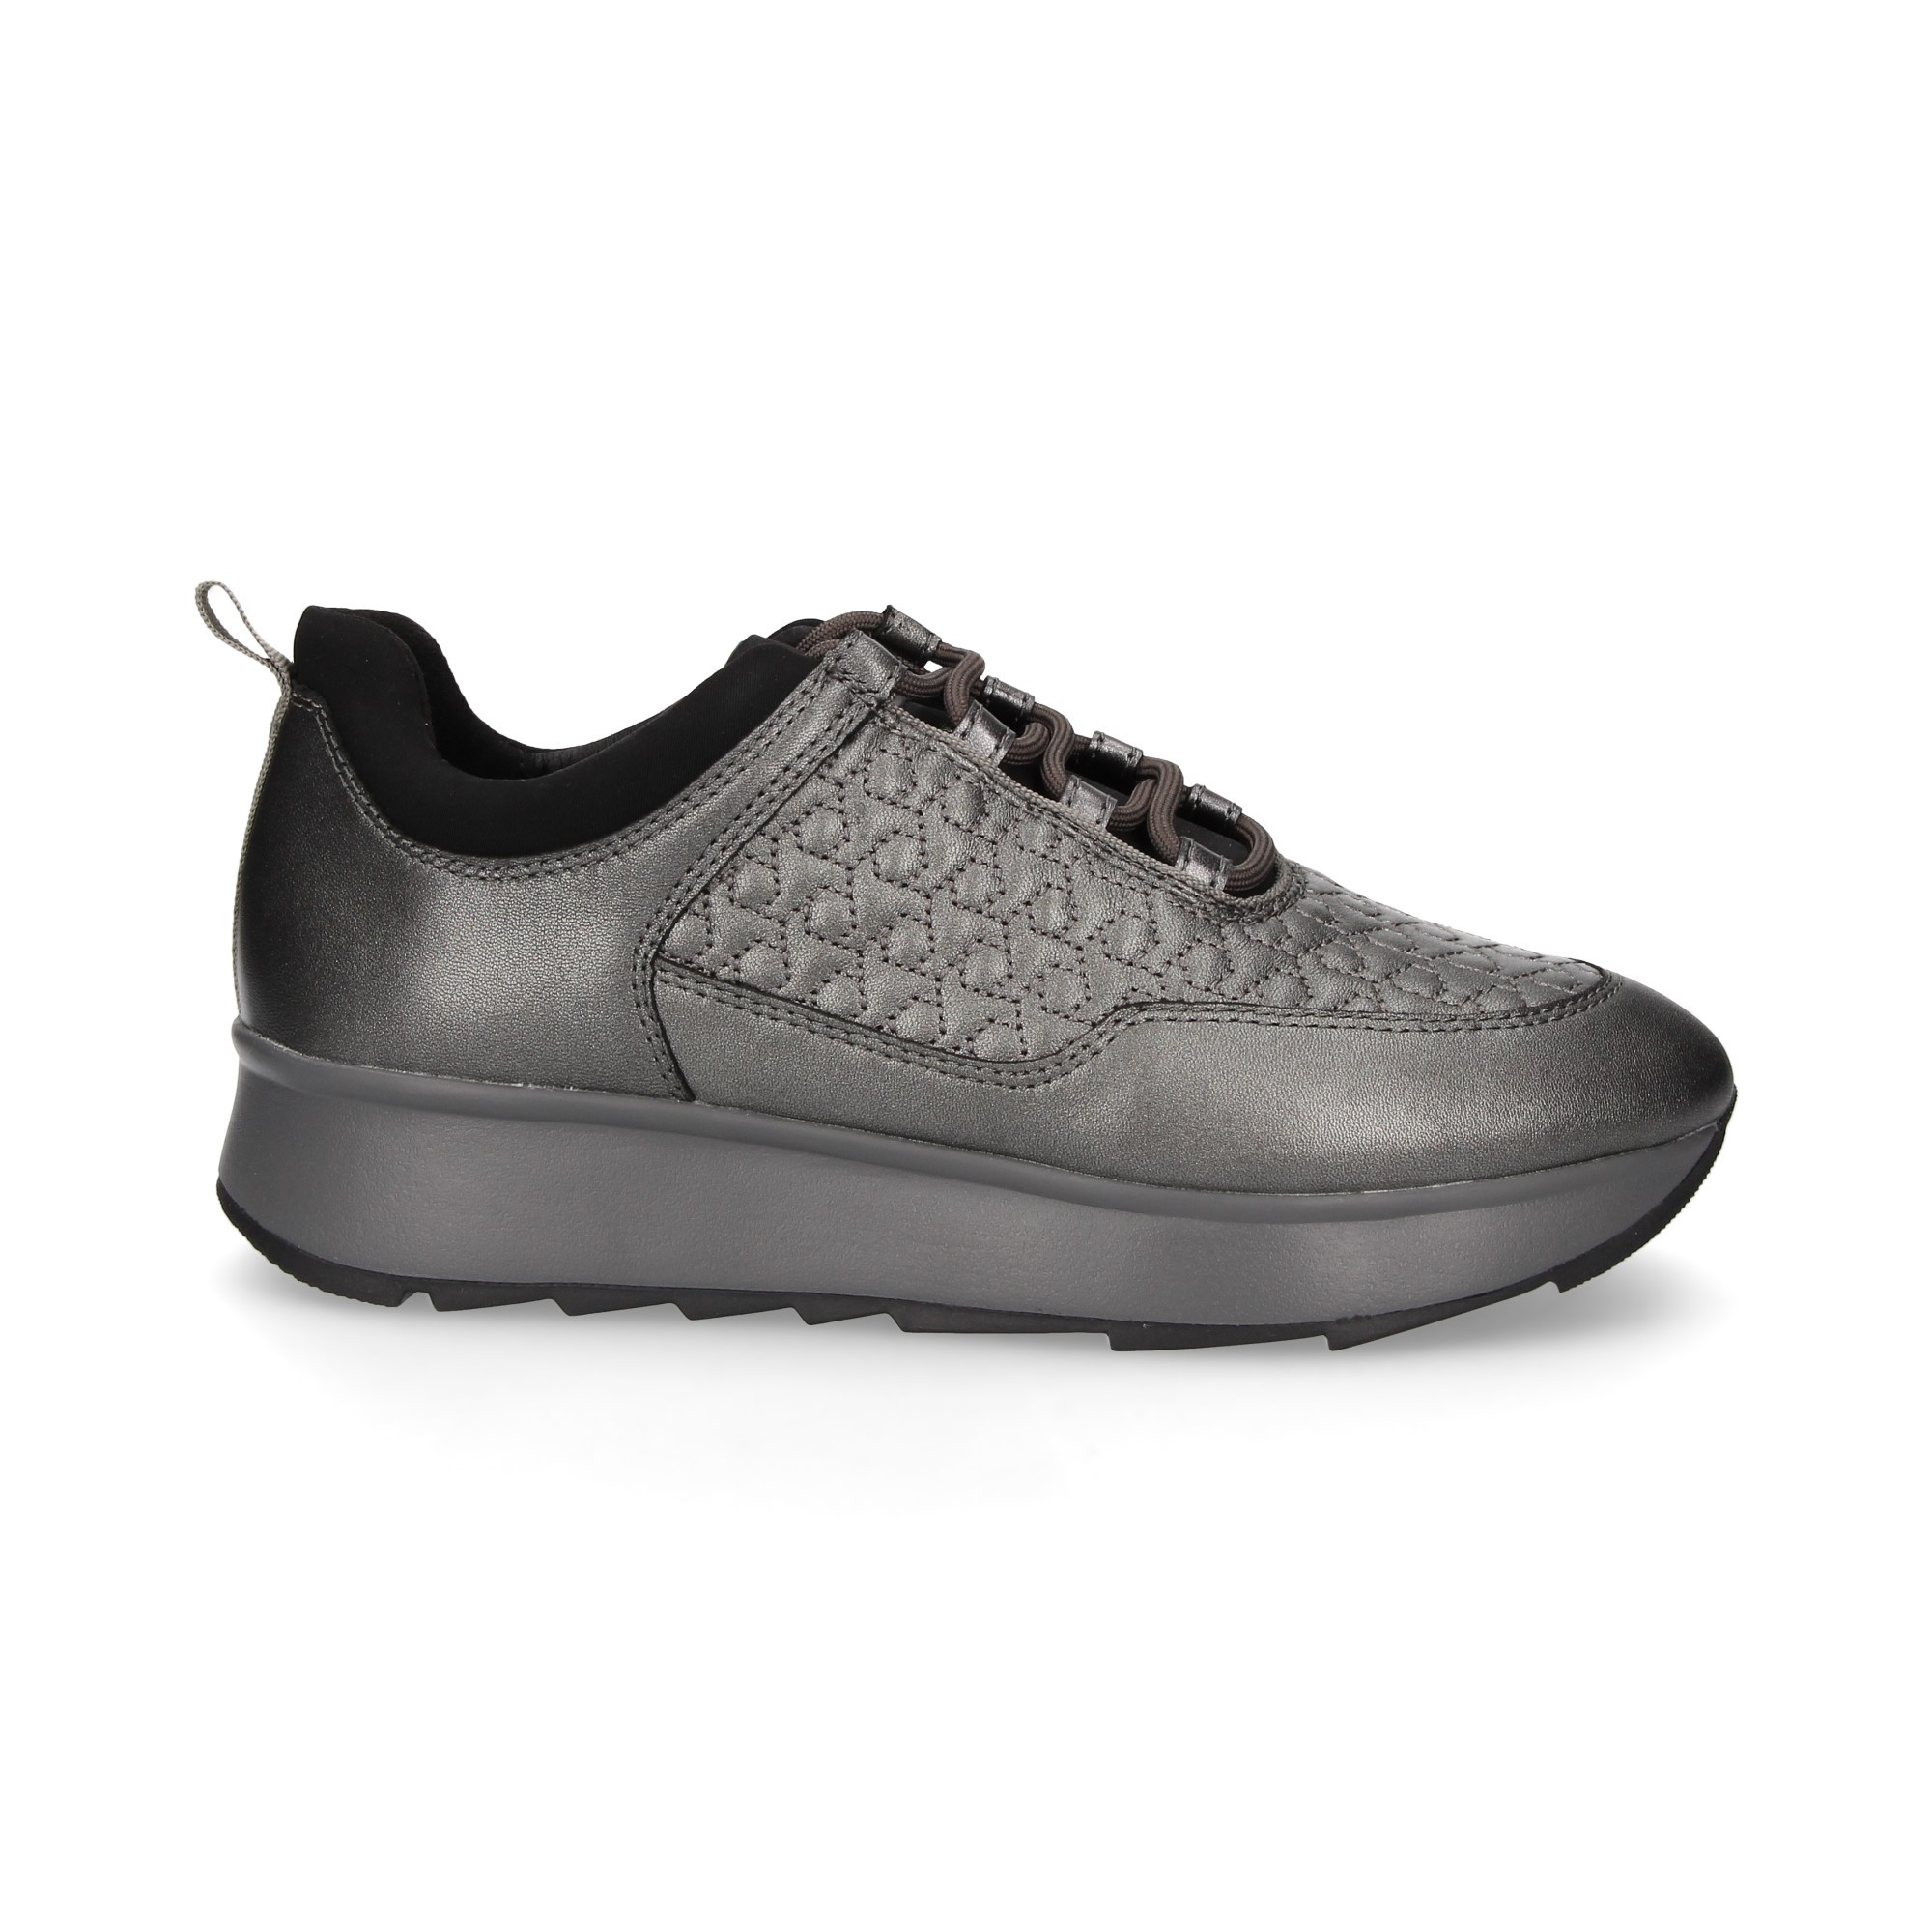 GEOX Women's Sneakers D845TC C1G9F GREY